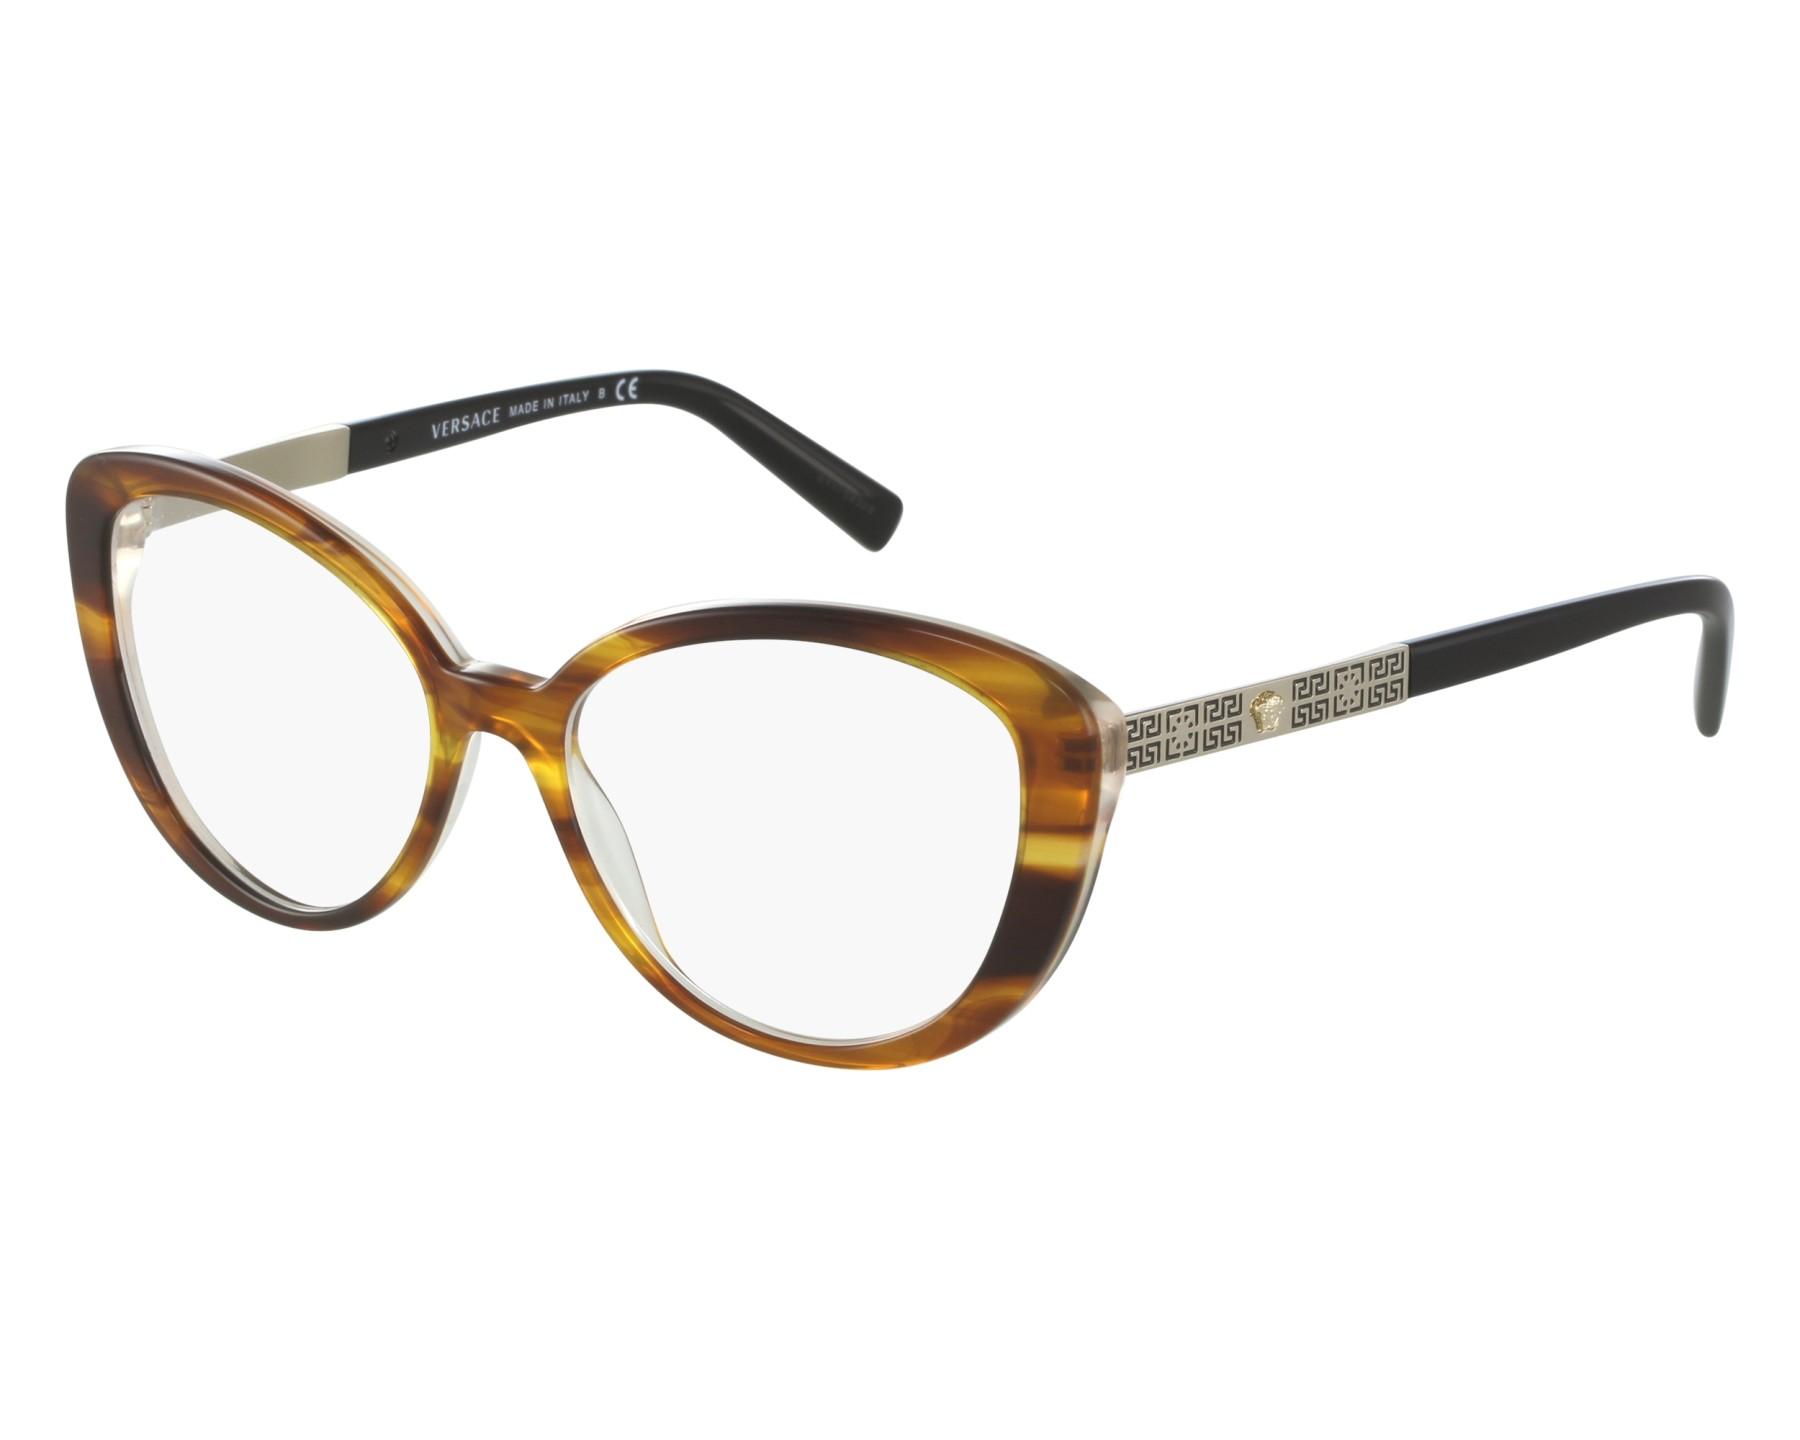 9e137de44c212 eyeglasses Versace VE-3229 5191 52-16 Havana Gold front view